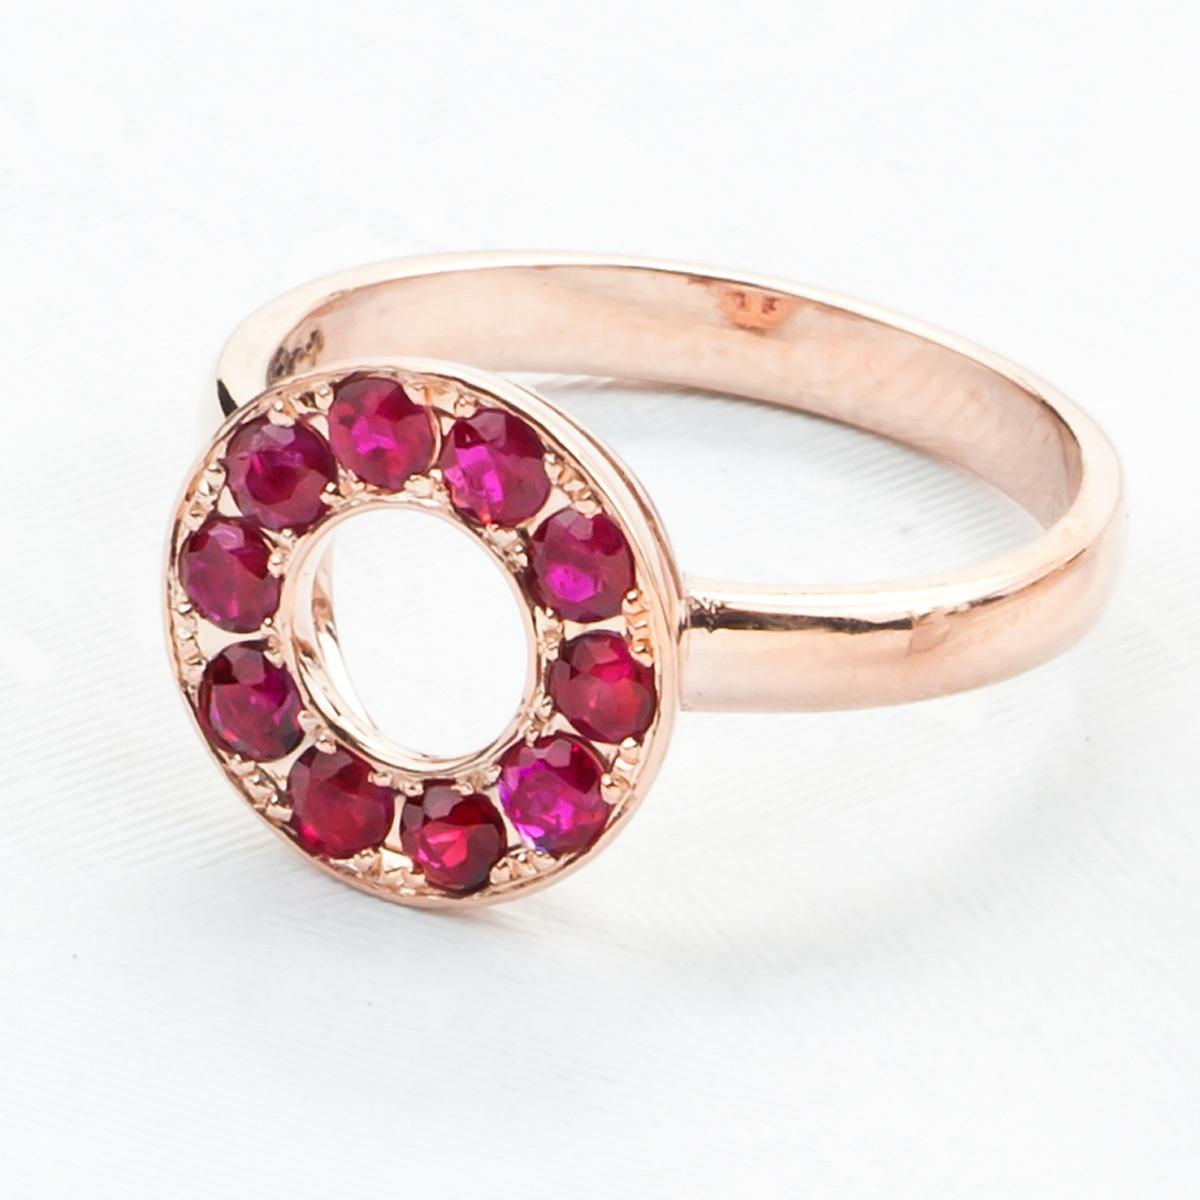 miaruby-myanmar-jewellery-gold-ruby-ring-ERHH0103.jpeg